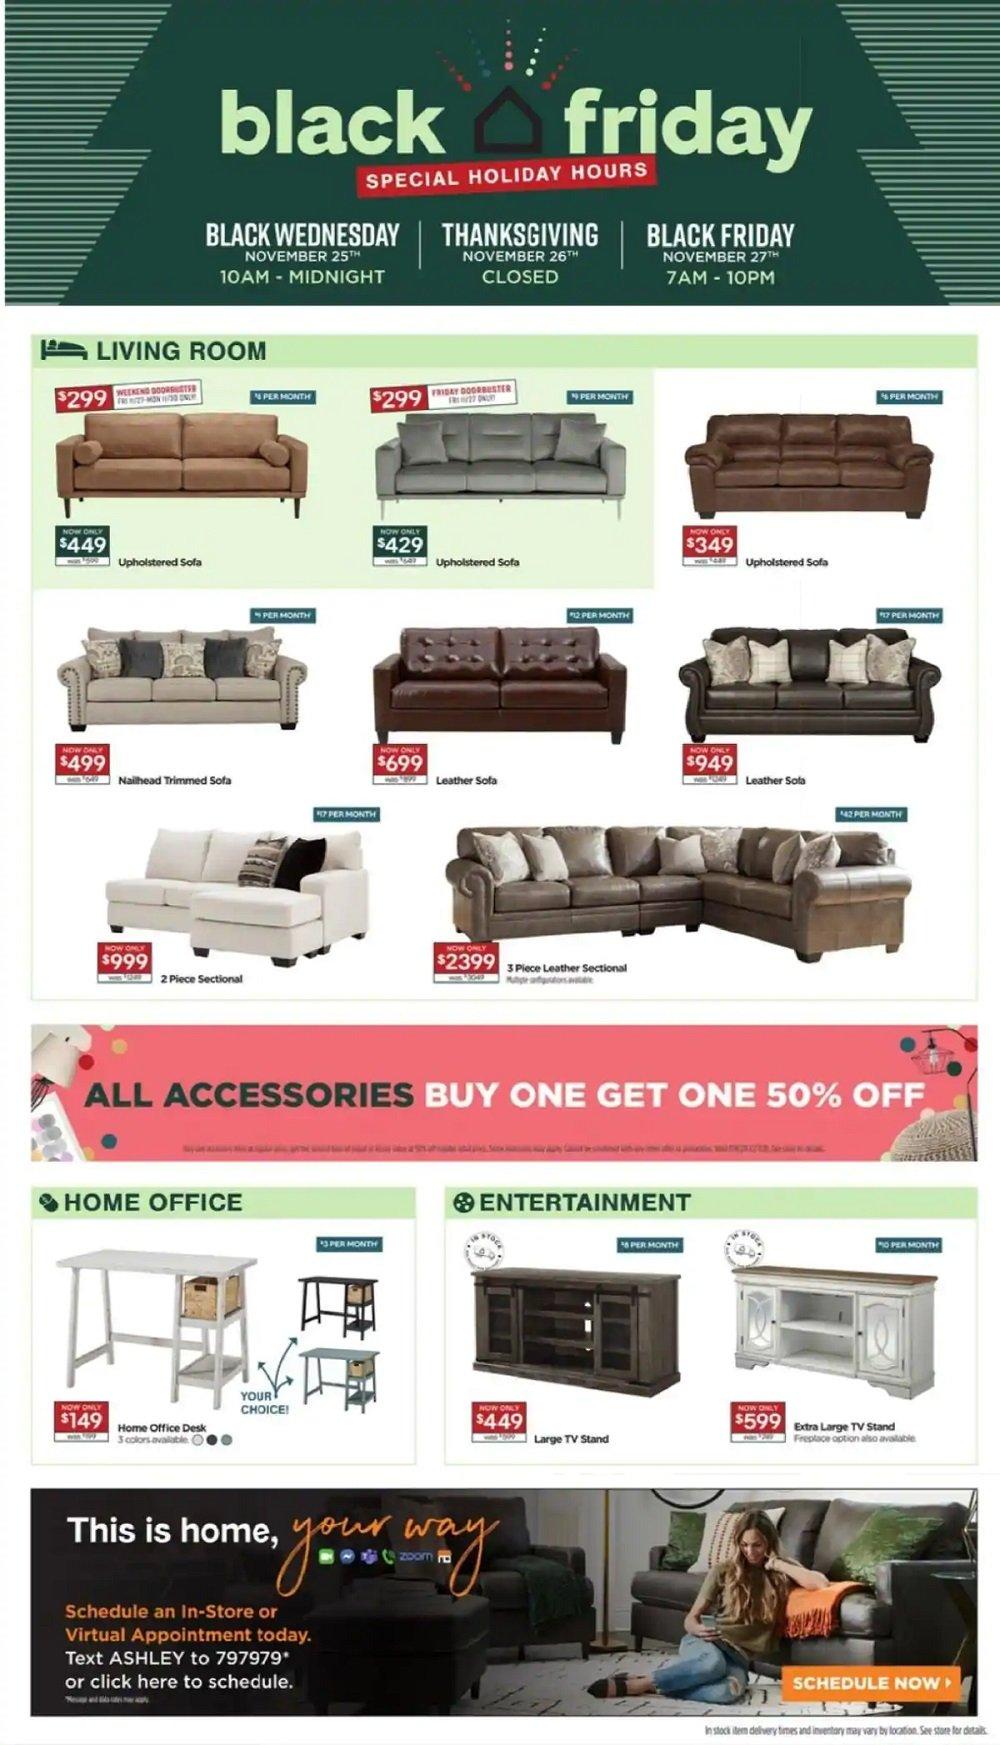 Ashley HomeStore Black Friday 2020 Page 4